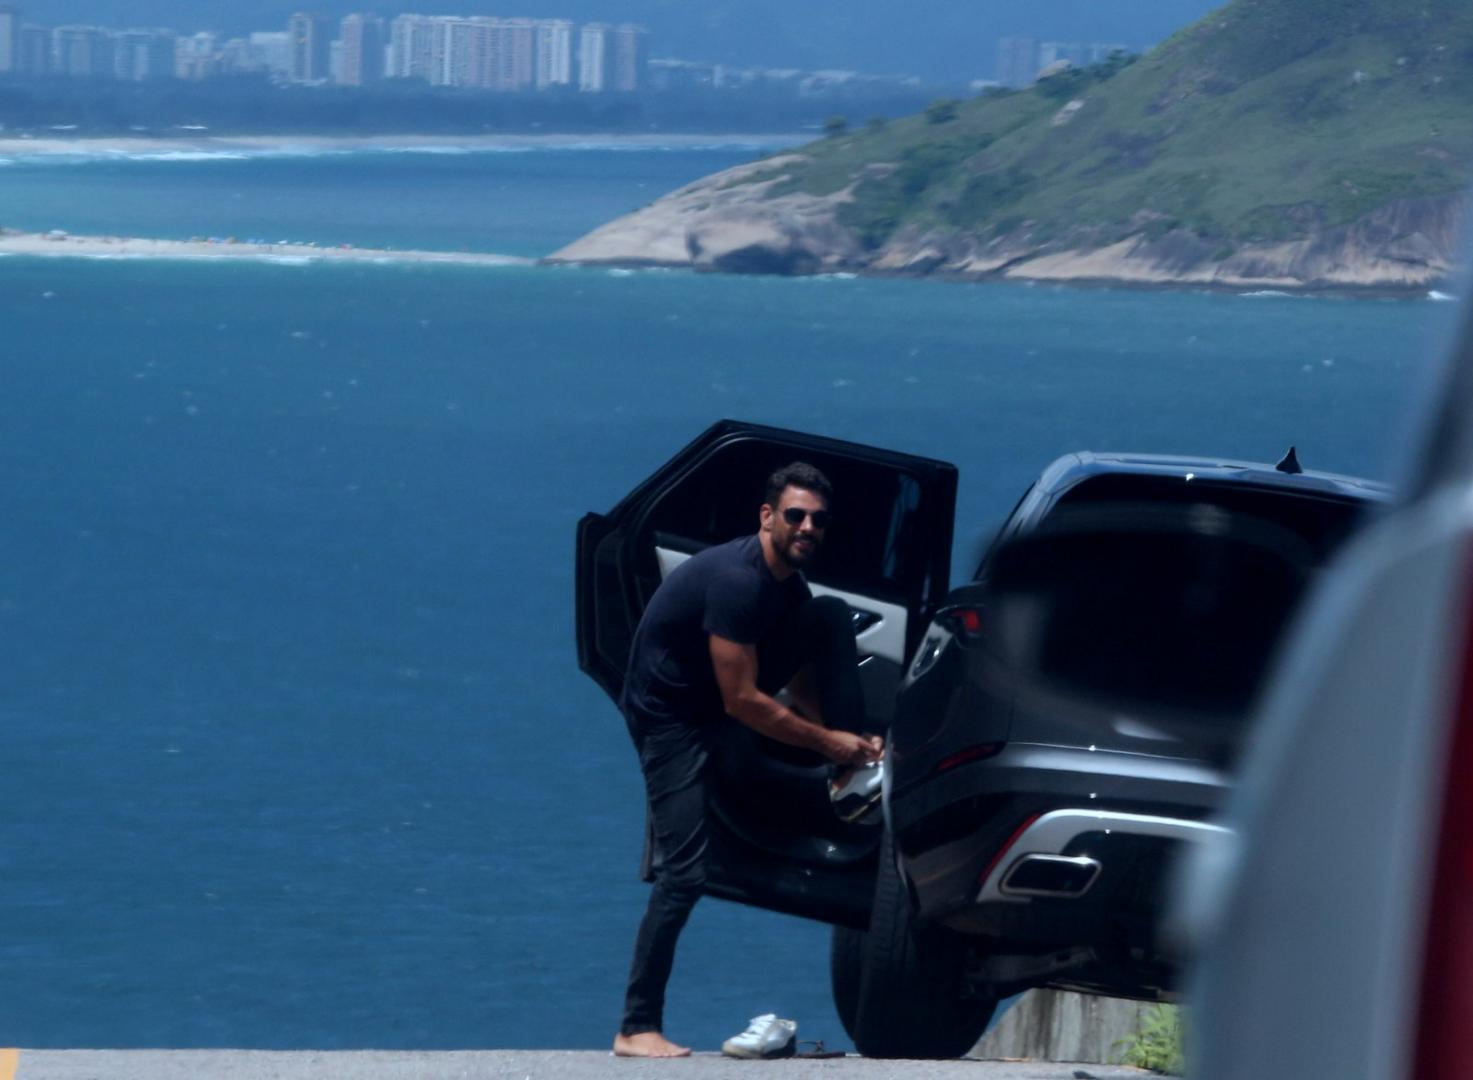 Cauã Reymond participa de ensaio fotográfico para marca de veículo